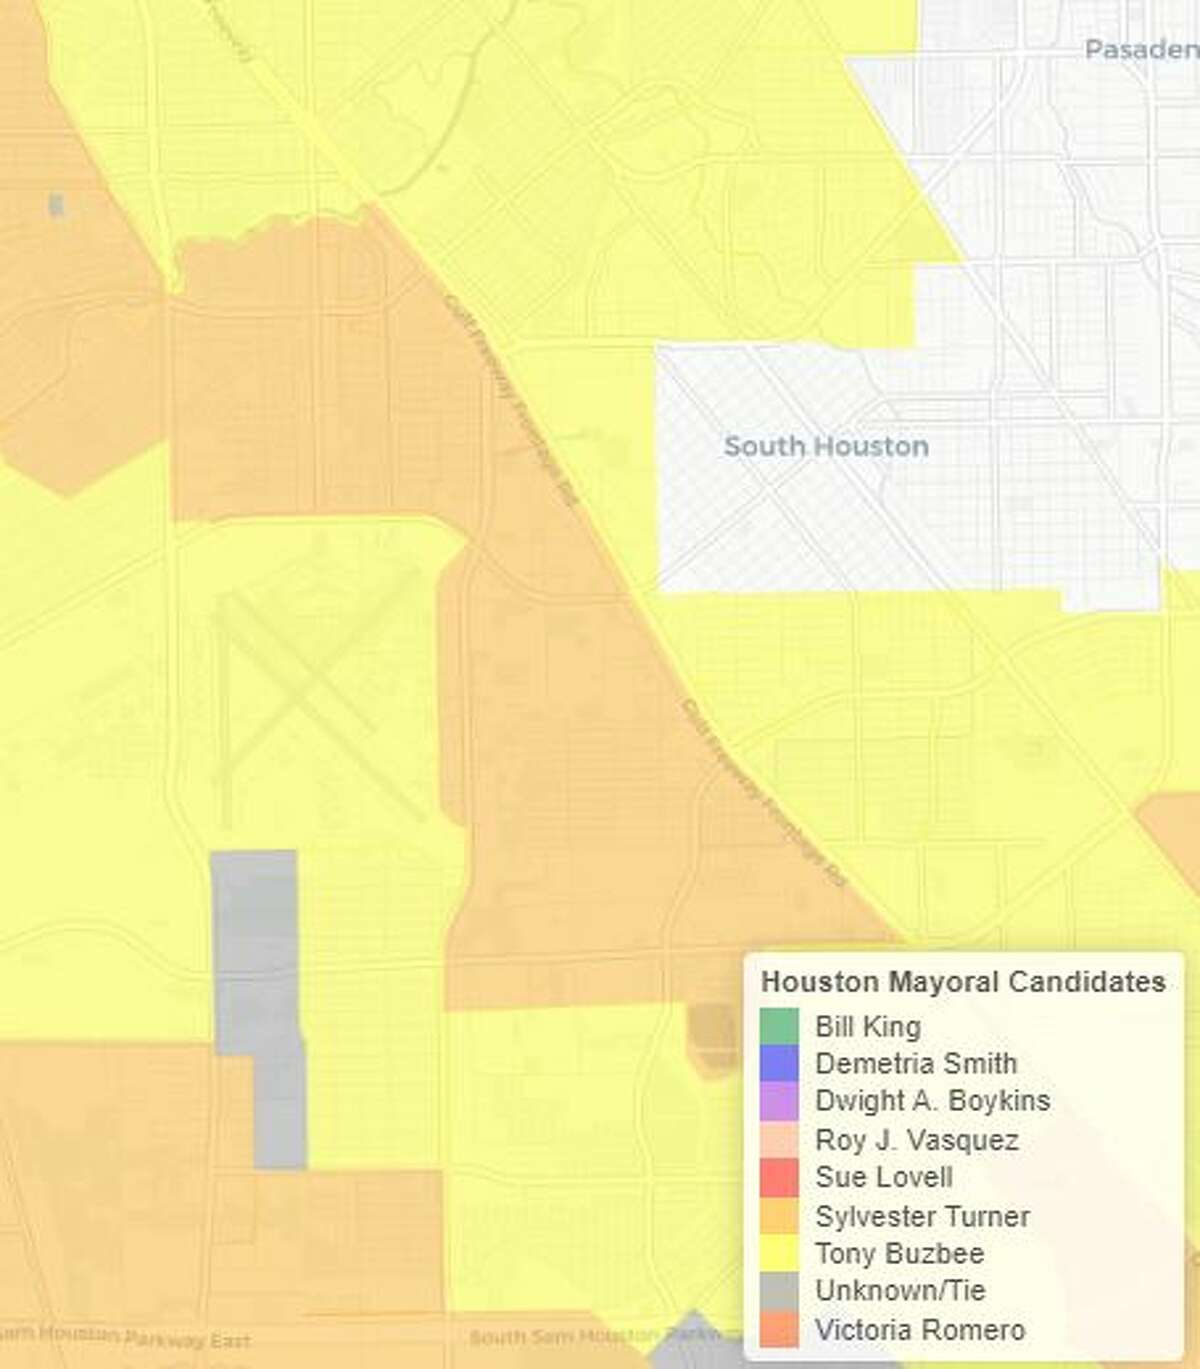 South Houston voters were split between Buzbee and Turner.